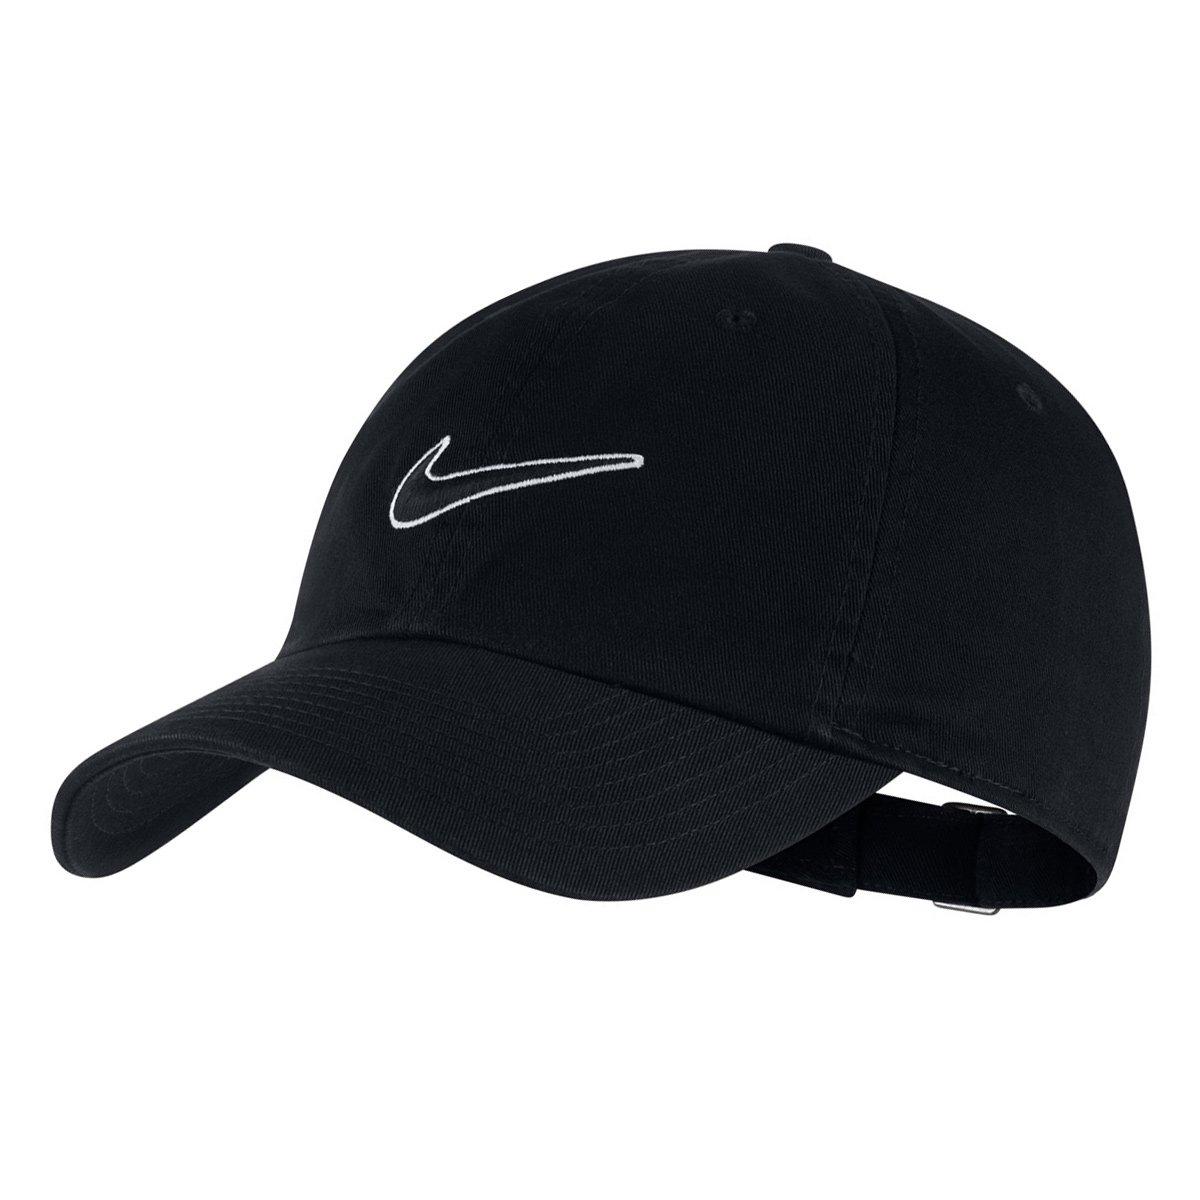 Boné Nike Sportswear H86 Futura Washed Aba Curva - Branco